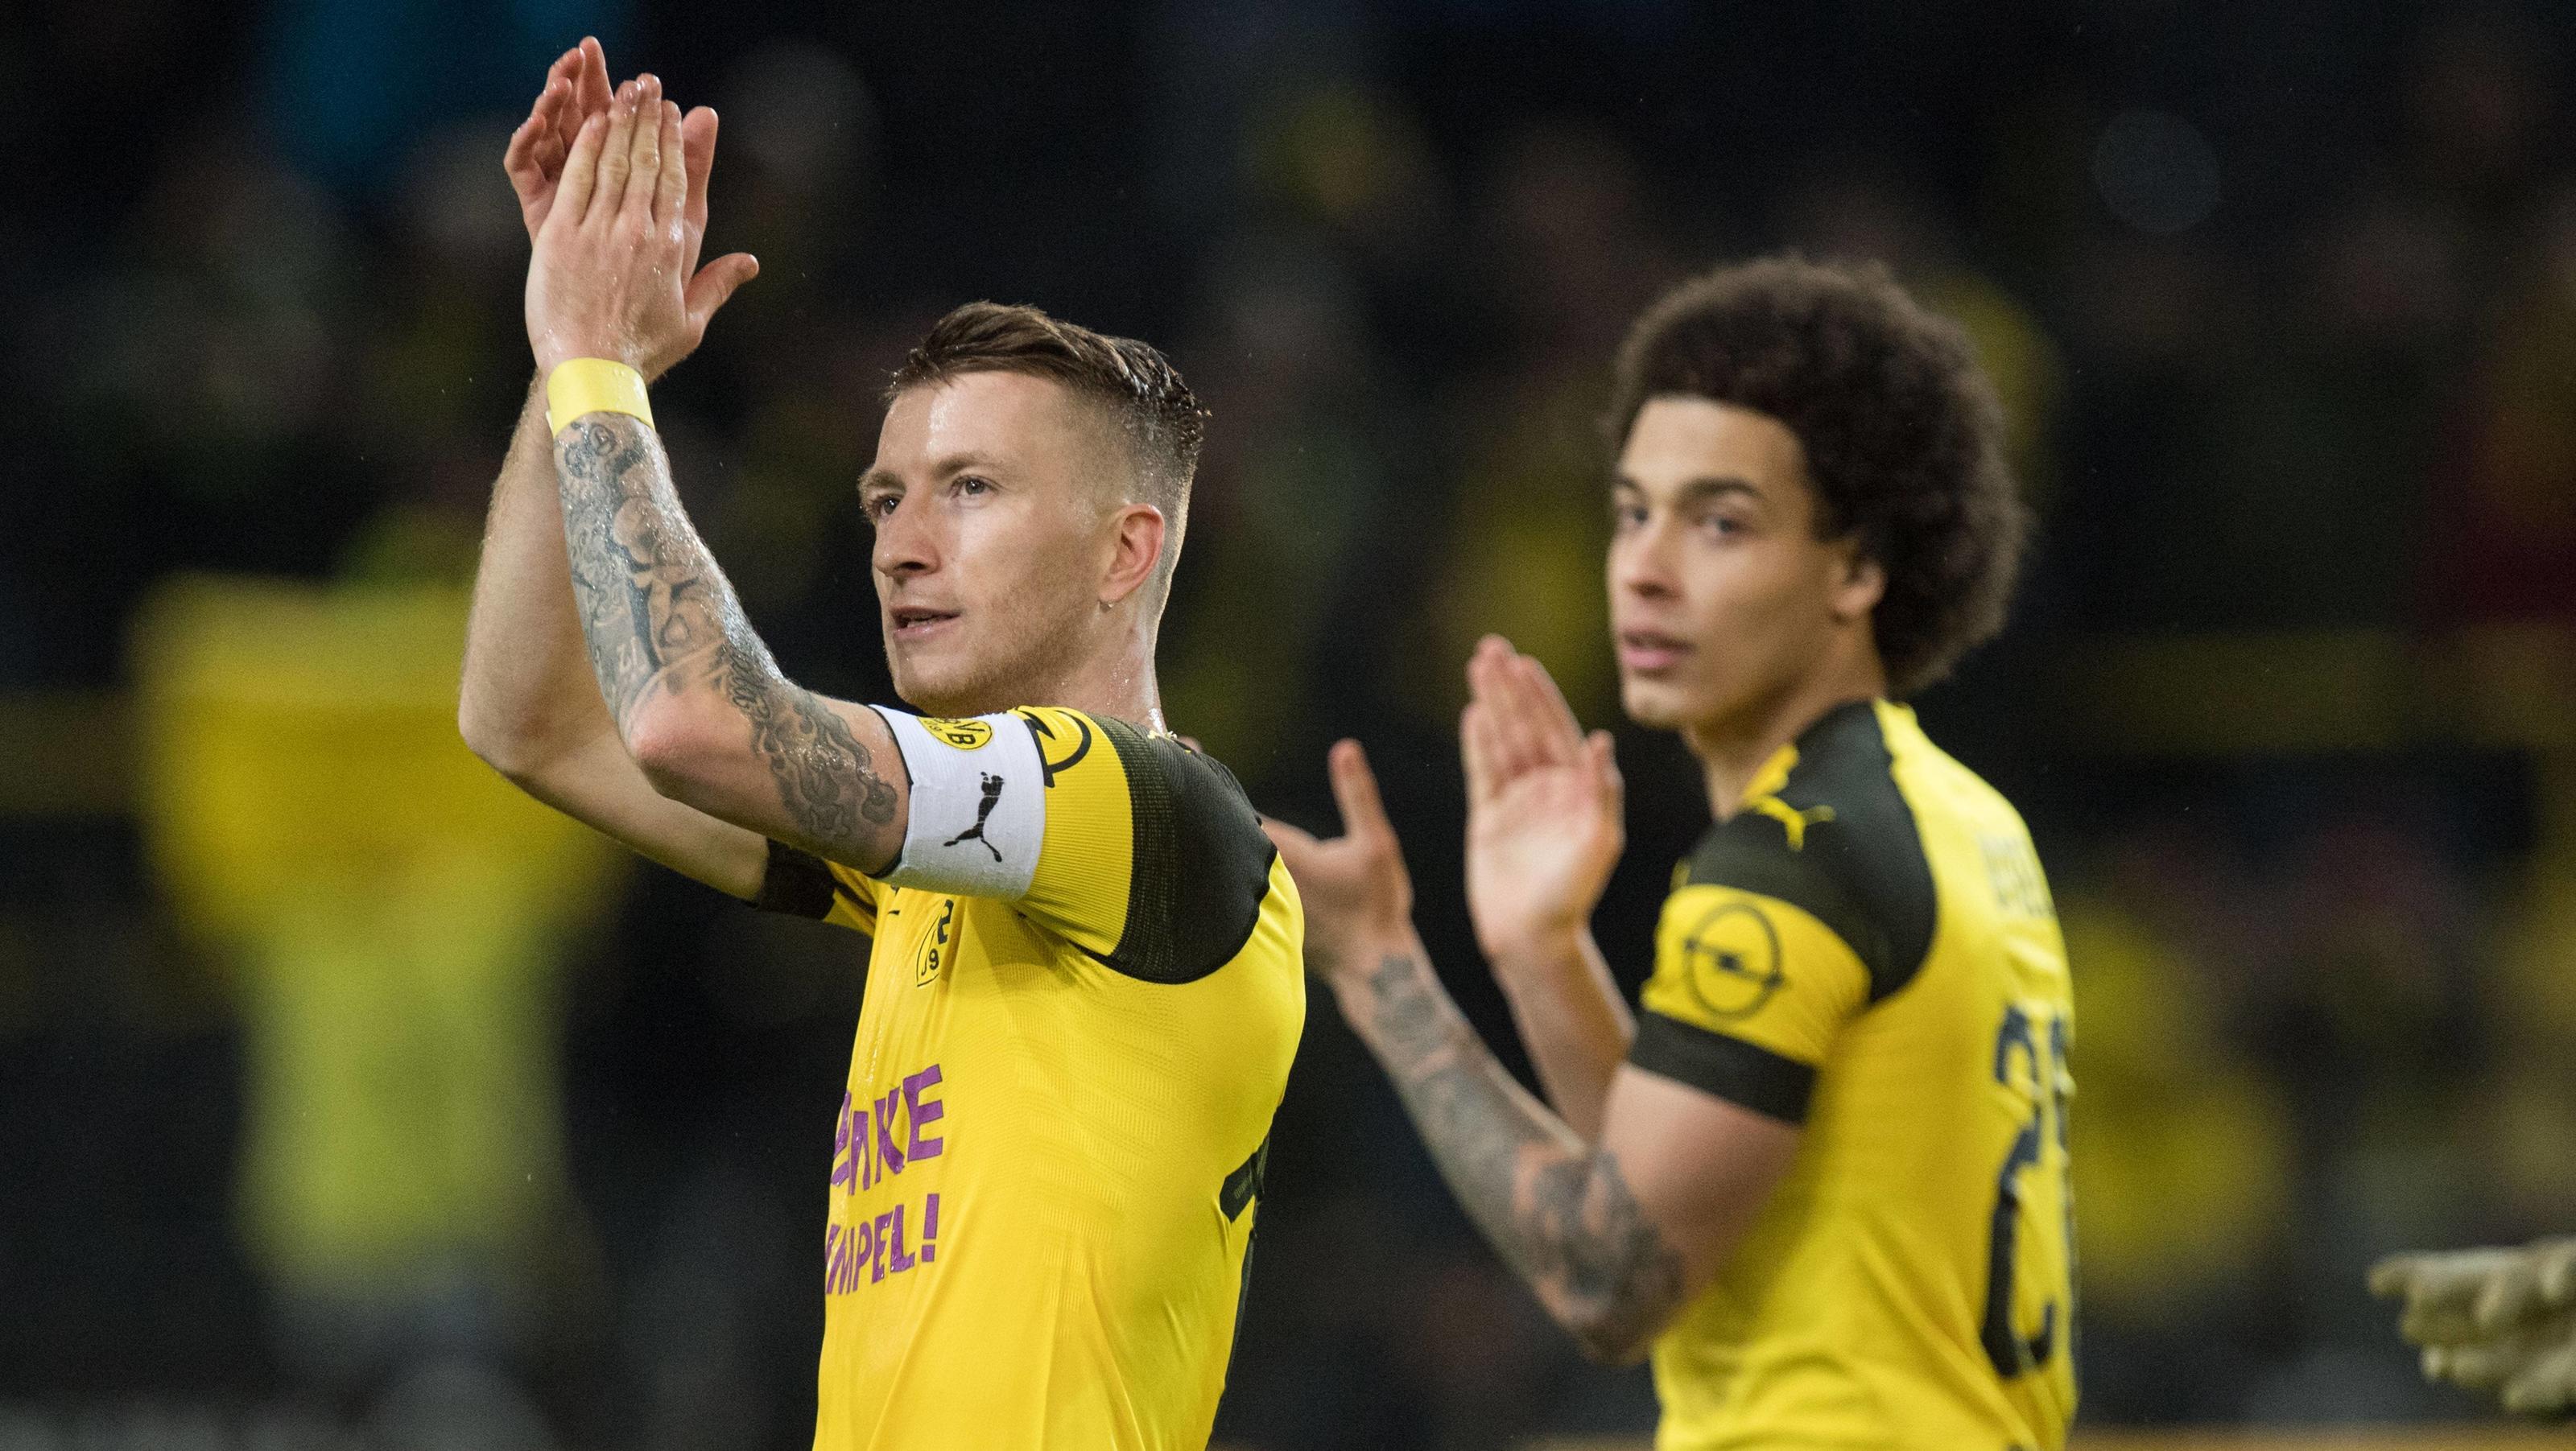 Bvb Frohe Weihnachten.Bundesliga So Feierten Borussia Dortmunds Stars Um Marco